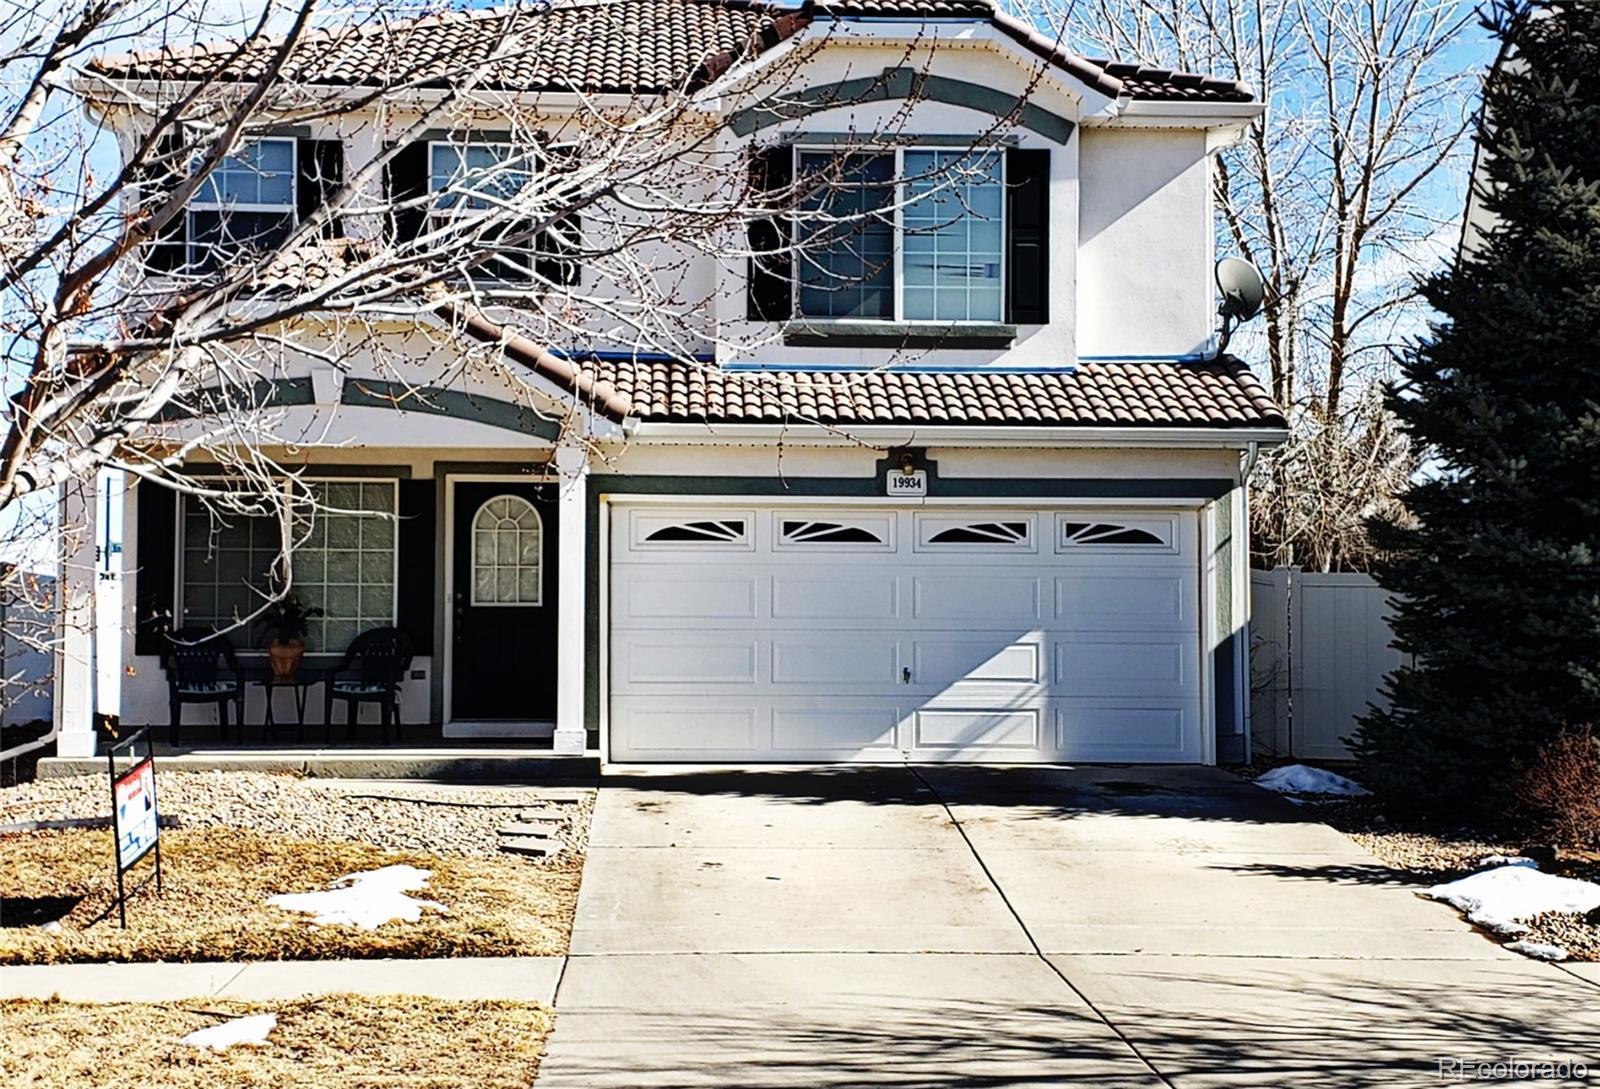 Terrific 19934 Elk Place Denver Co Mls 5557683 Assist2Sell Home Interior And Landscaping Ologienasavecom